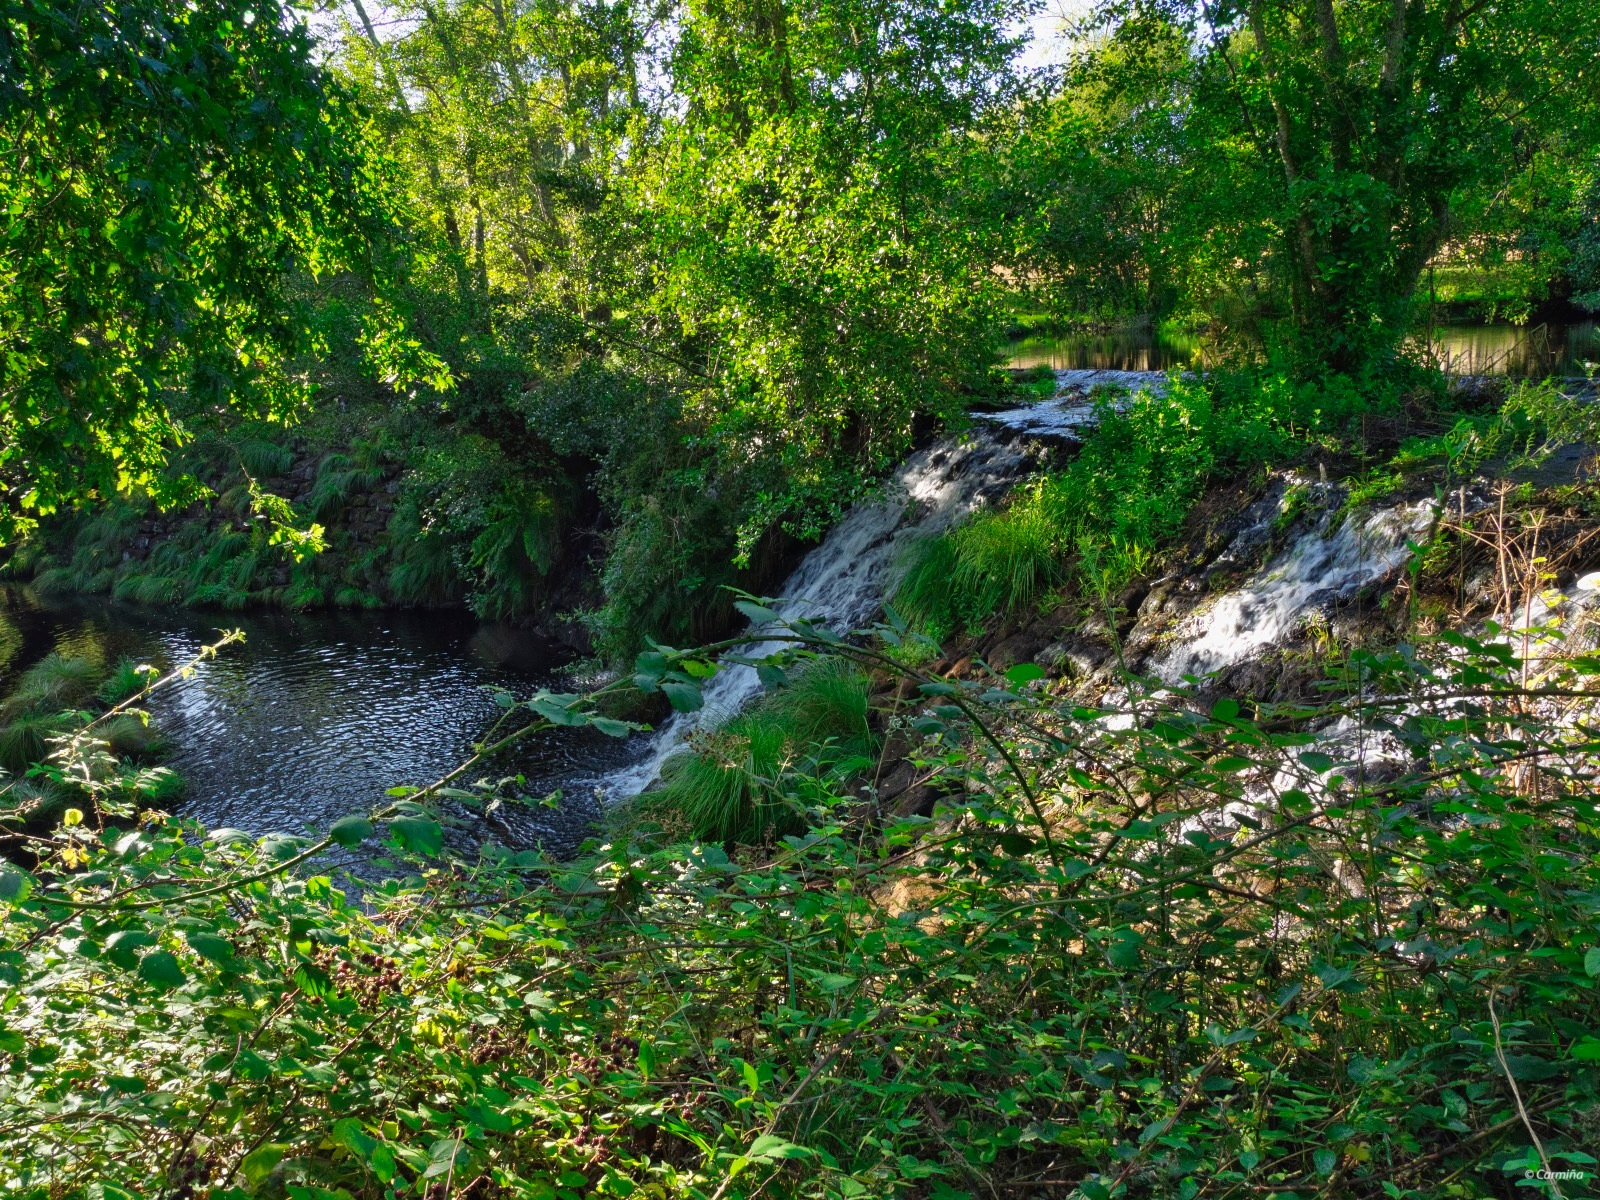 Árboles, río, cascada       by carmina.waterstone